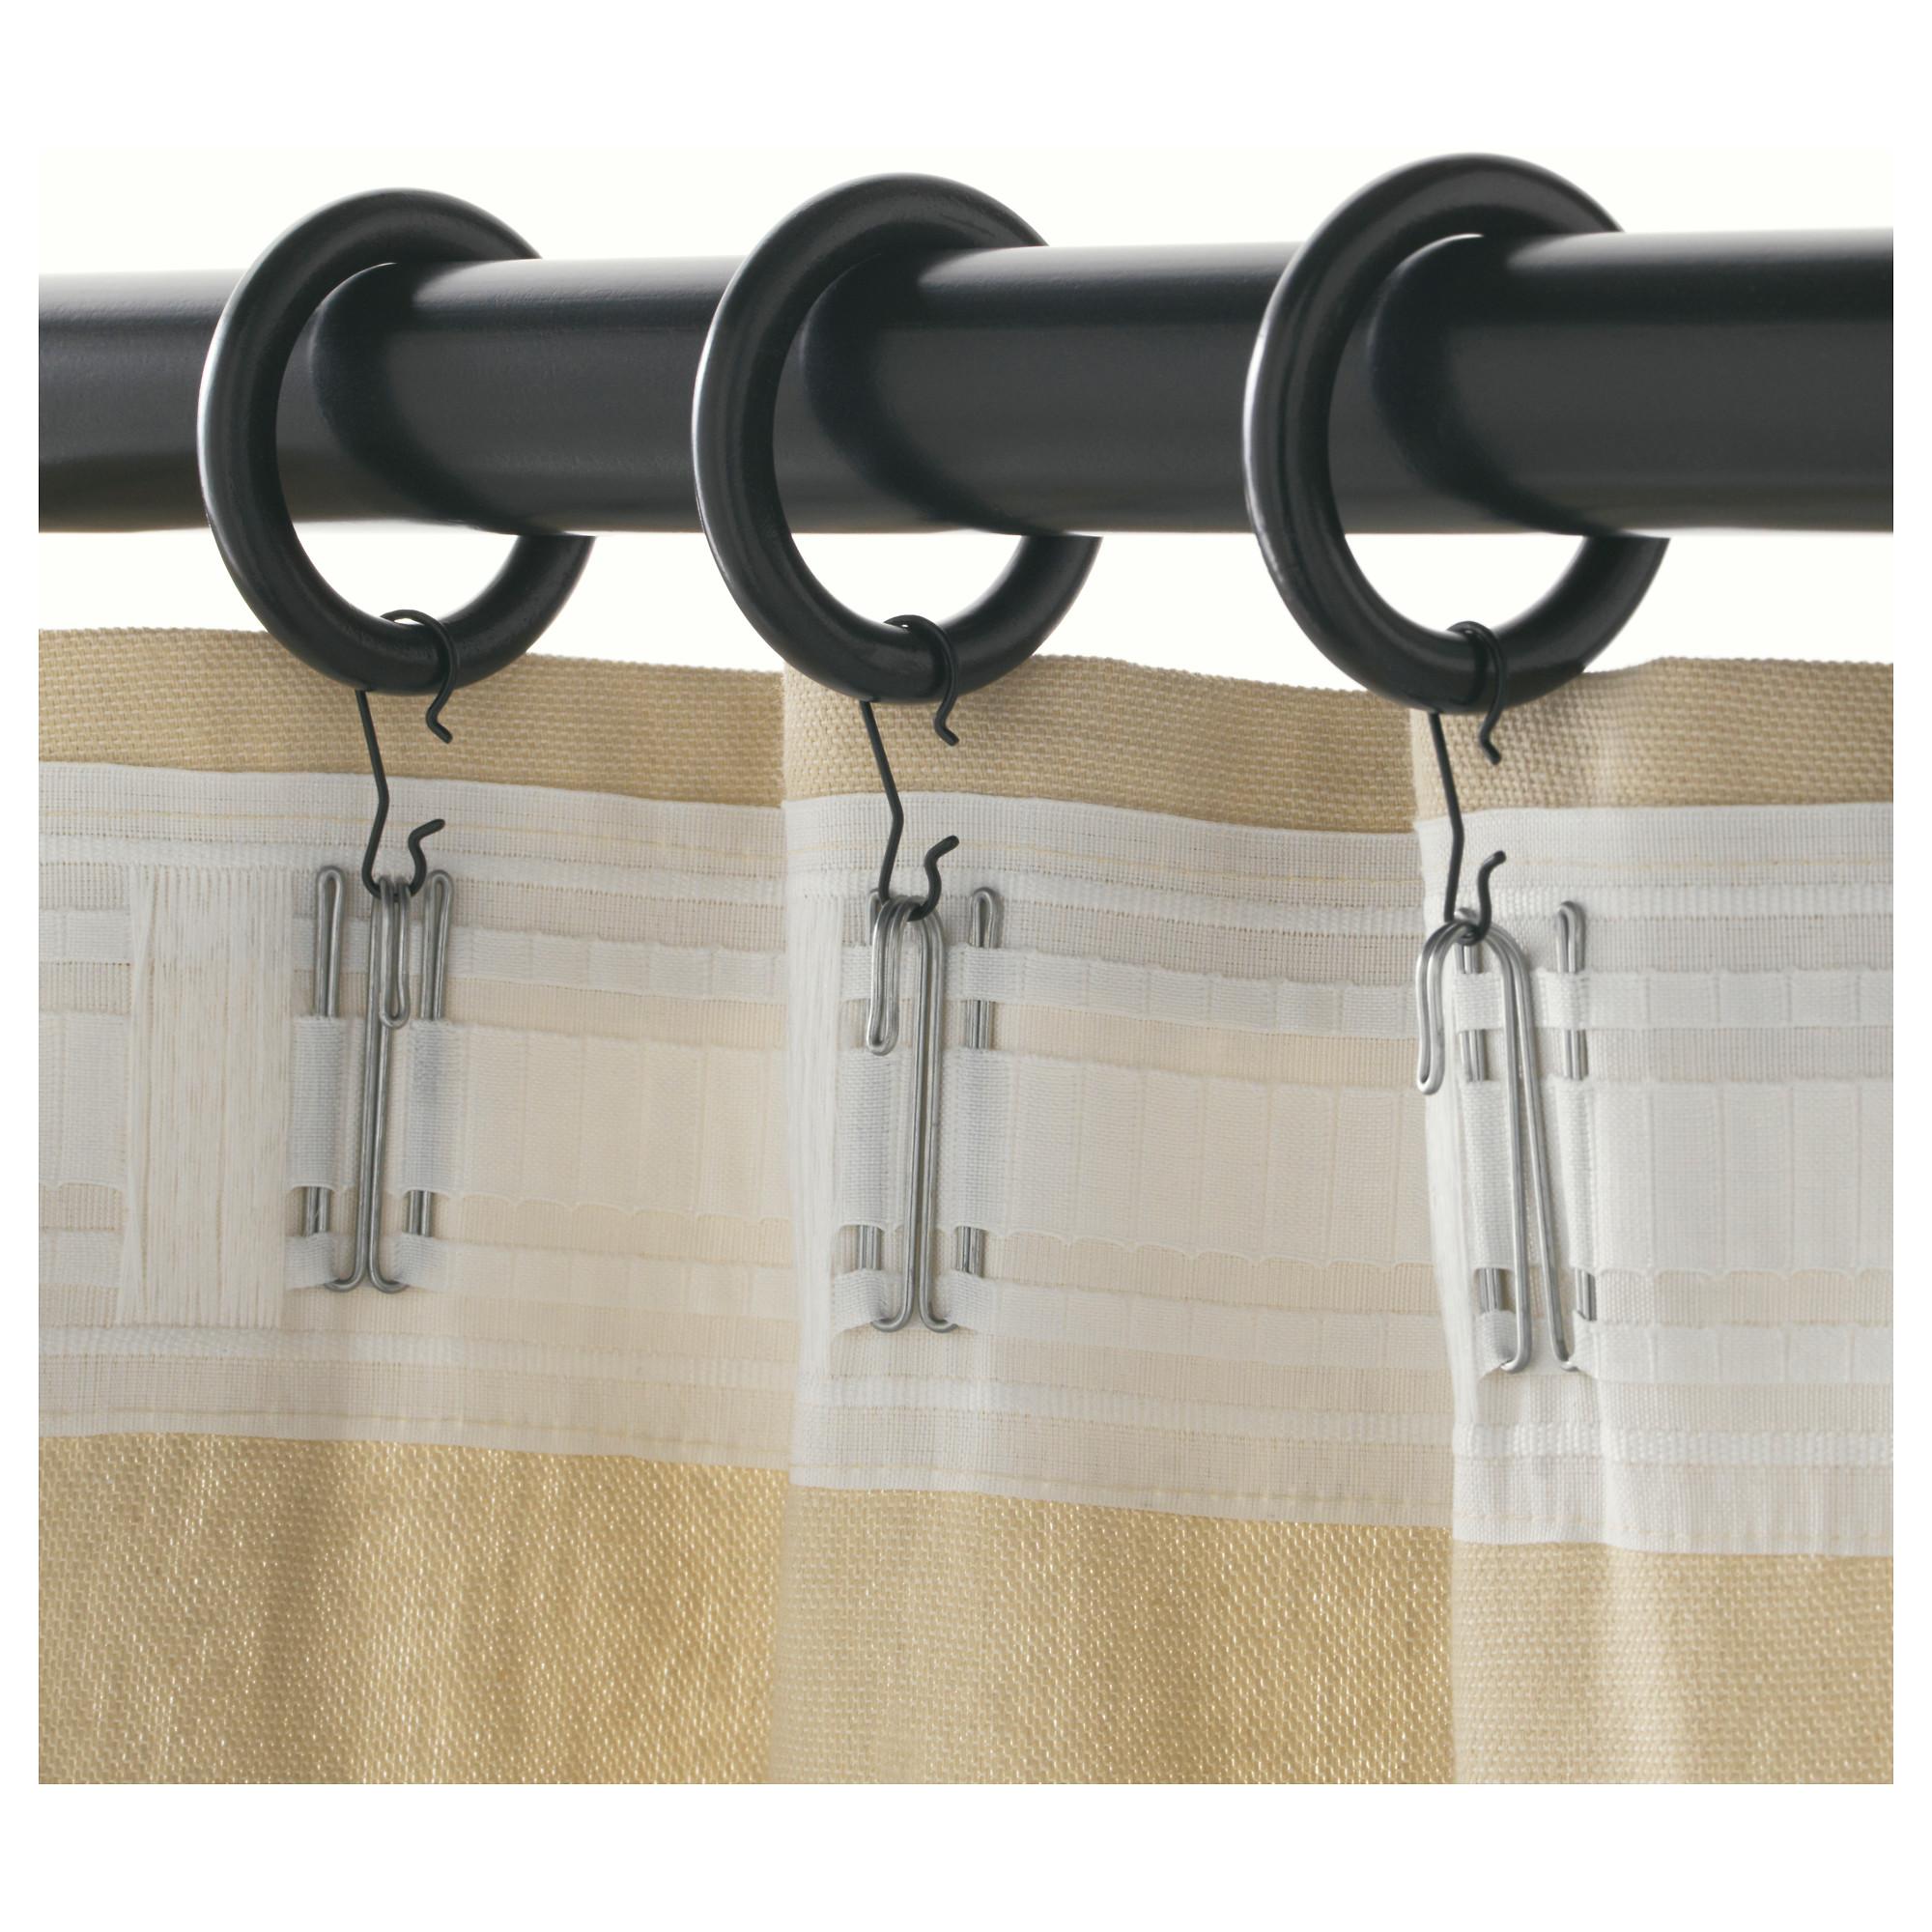 Poang Ikea Curtain Rods Rails Komnit Store